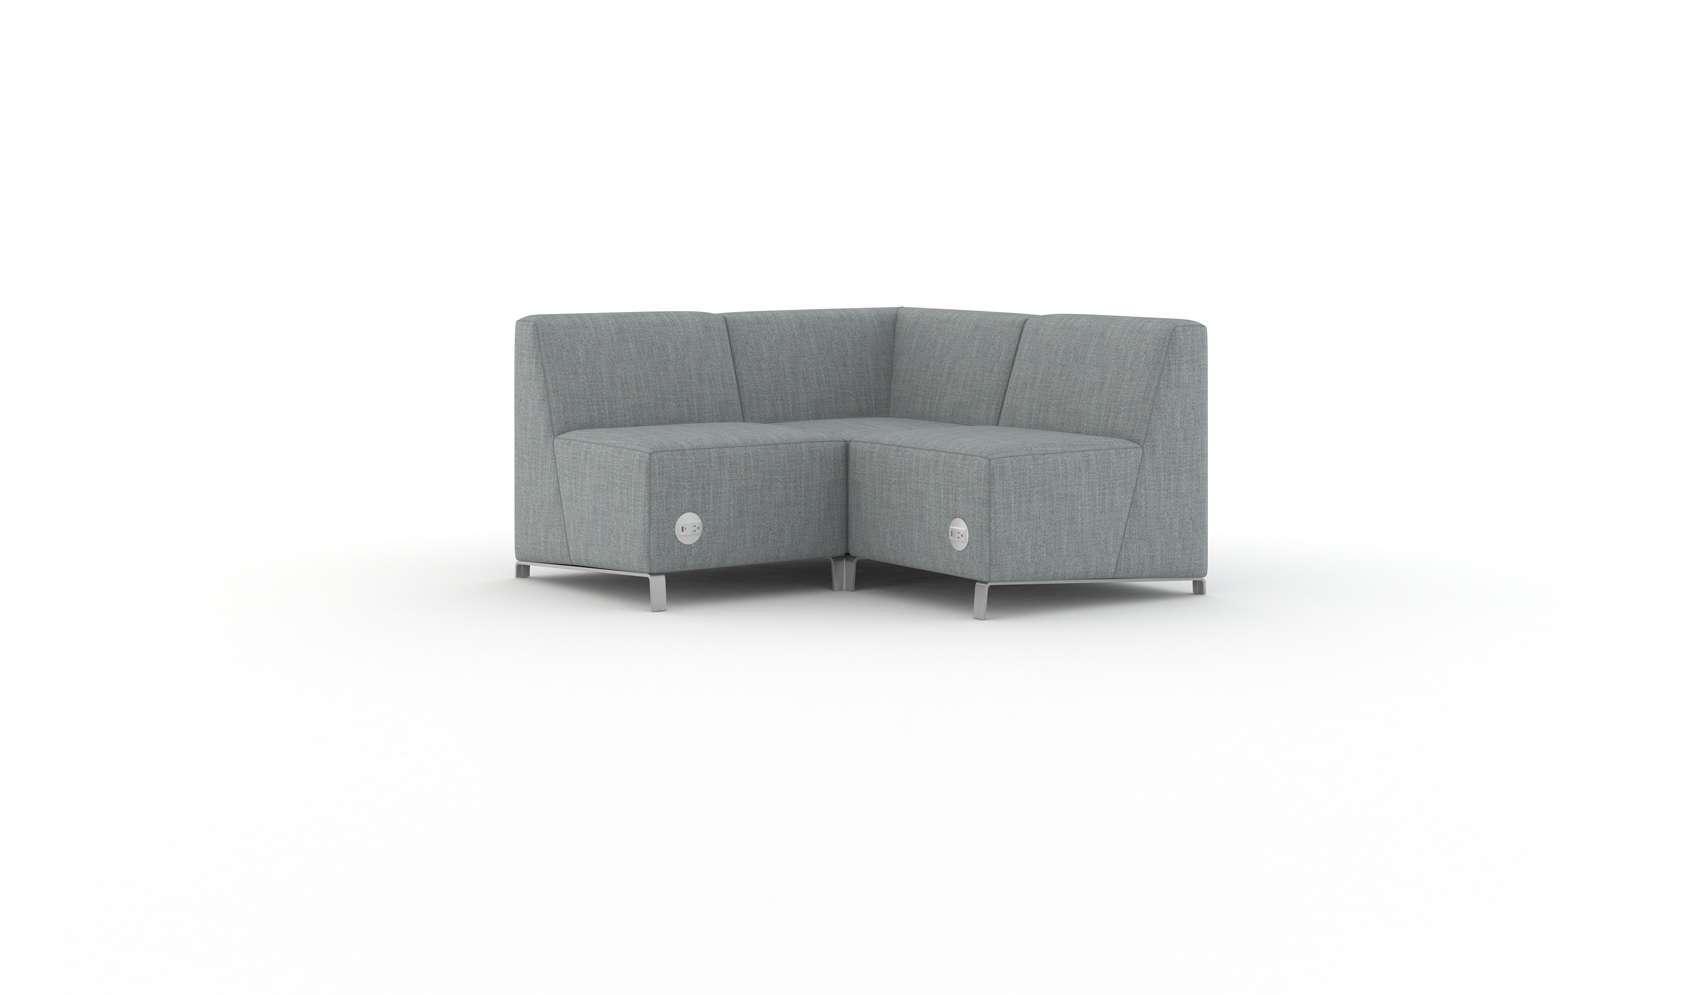 Fantastic Ofs Neom Modular Lounge Product Dailytribune Chair Design For Home Dailytribuneorg